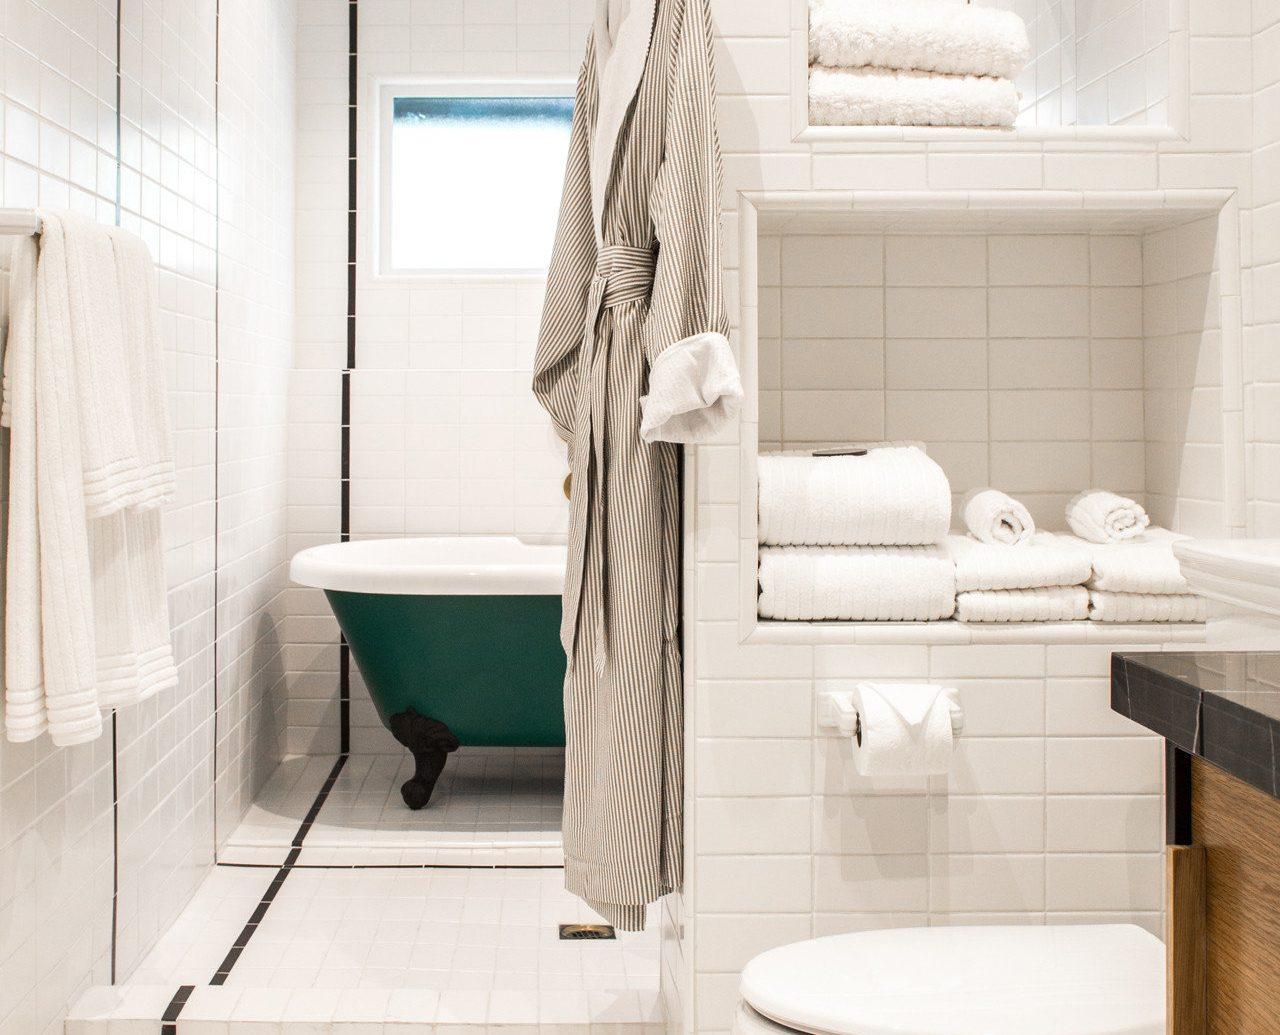 Bath bath robe bathroom Boutique clean Hotels shower white room indoor floor toilet plumbing fixture interior design home flooring bidet Design tile tiled